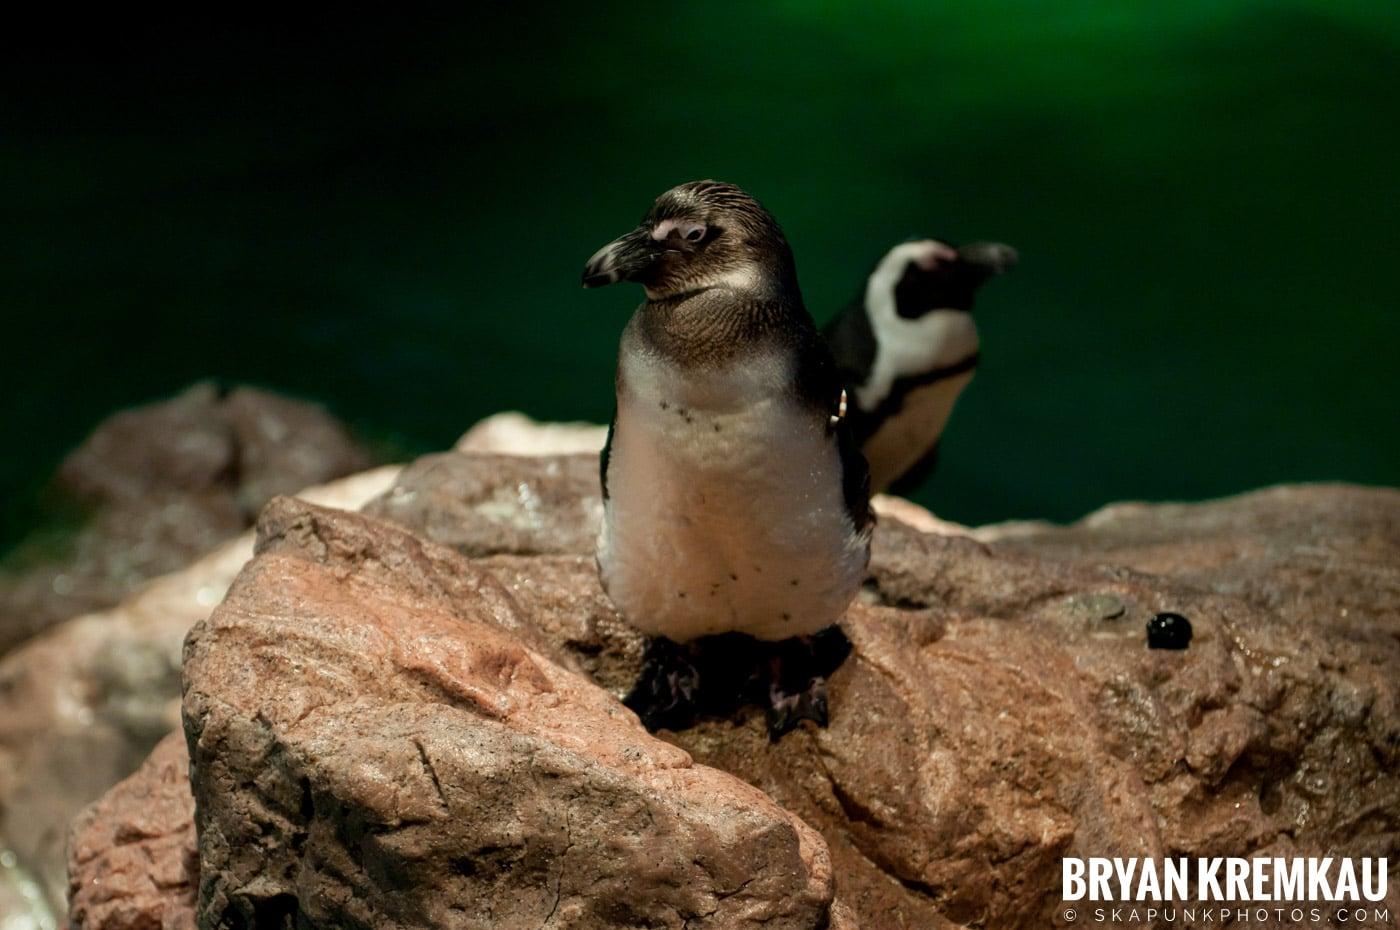 New England Aquarium @ Boston, MA - 6.2.12 (7)